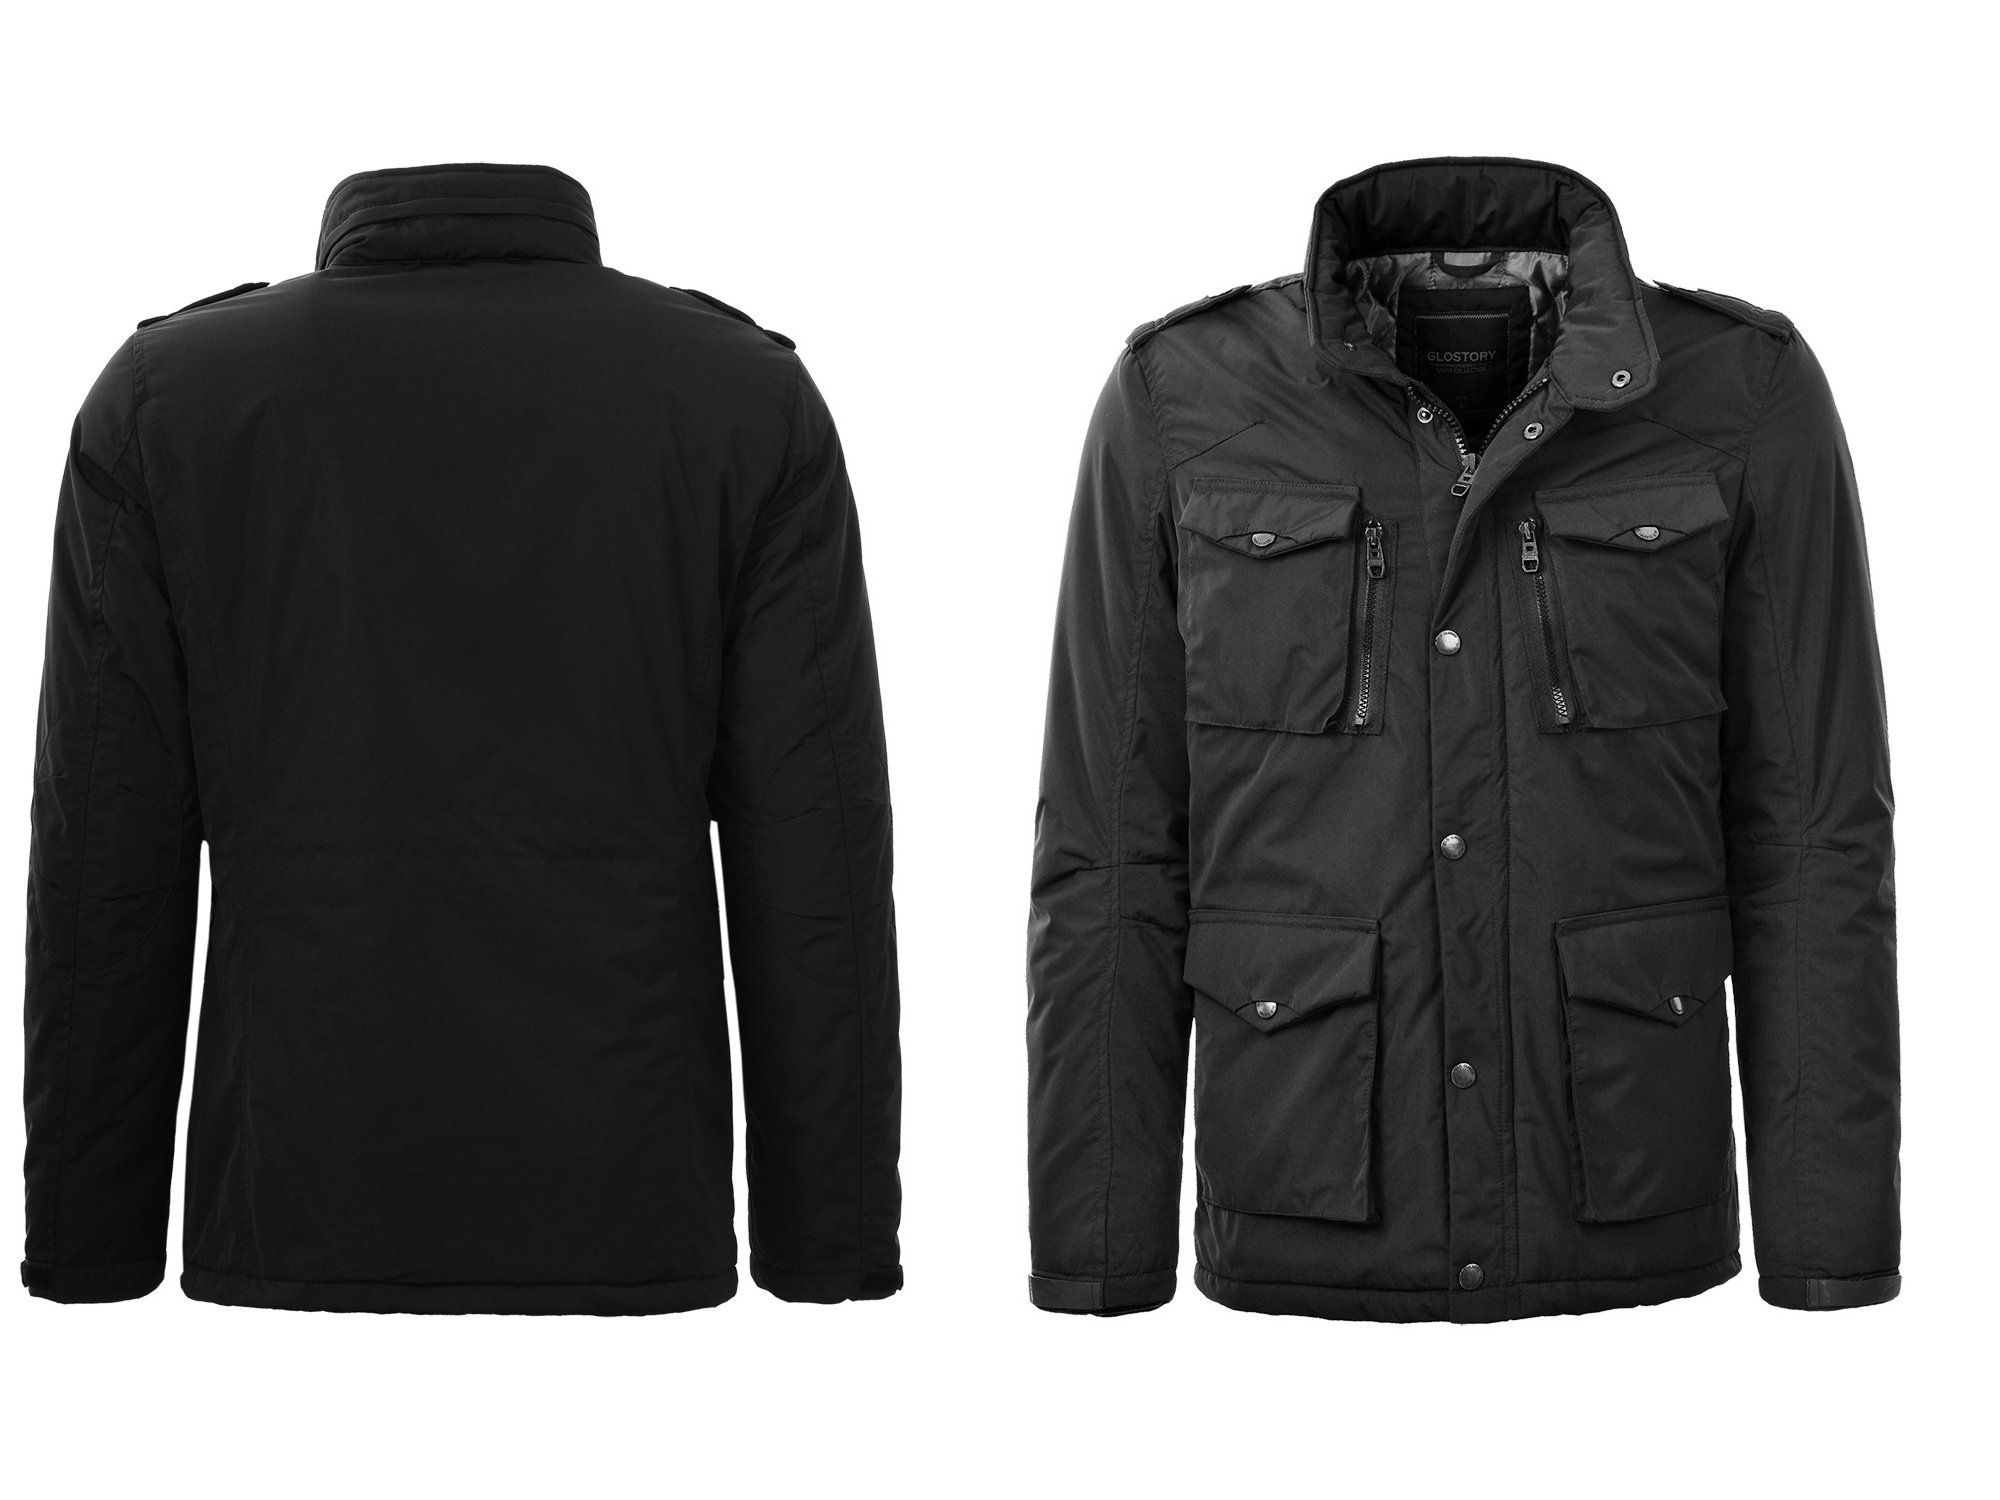 Kurtka Meska Parka Meska Kurtka Elegancka Czarna X 7061991341 Oficjalne Archiwum Allegro Jackets Military Jacket Fashion